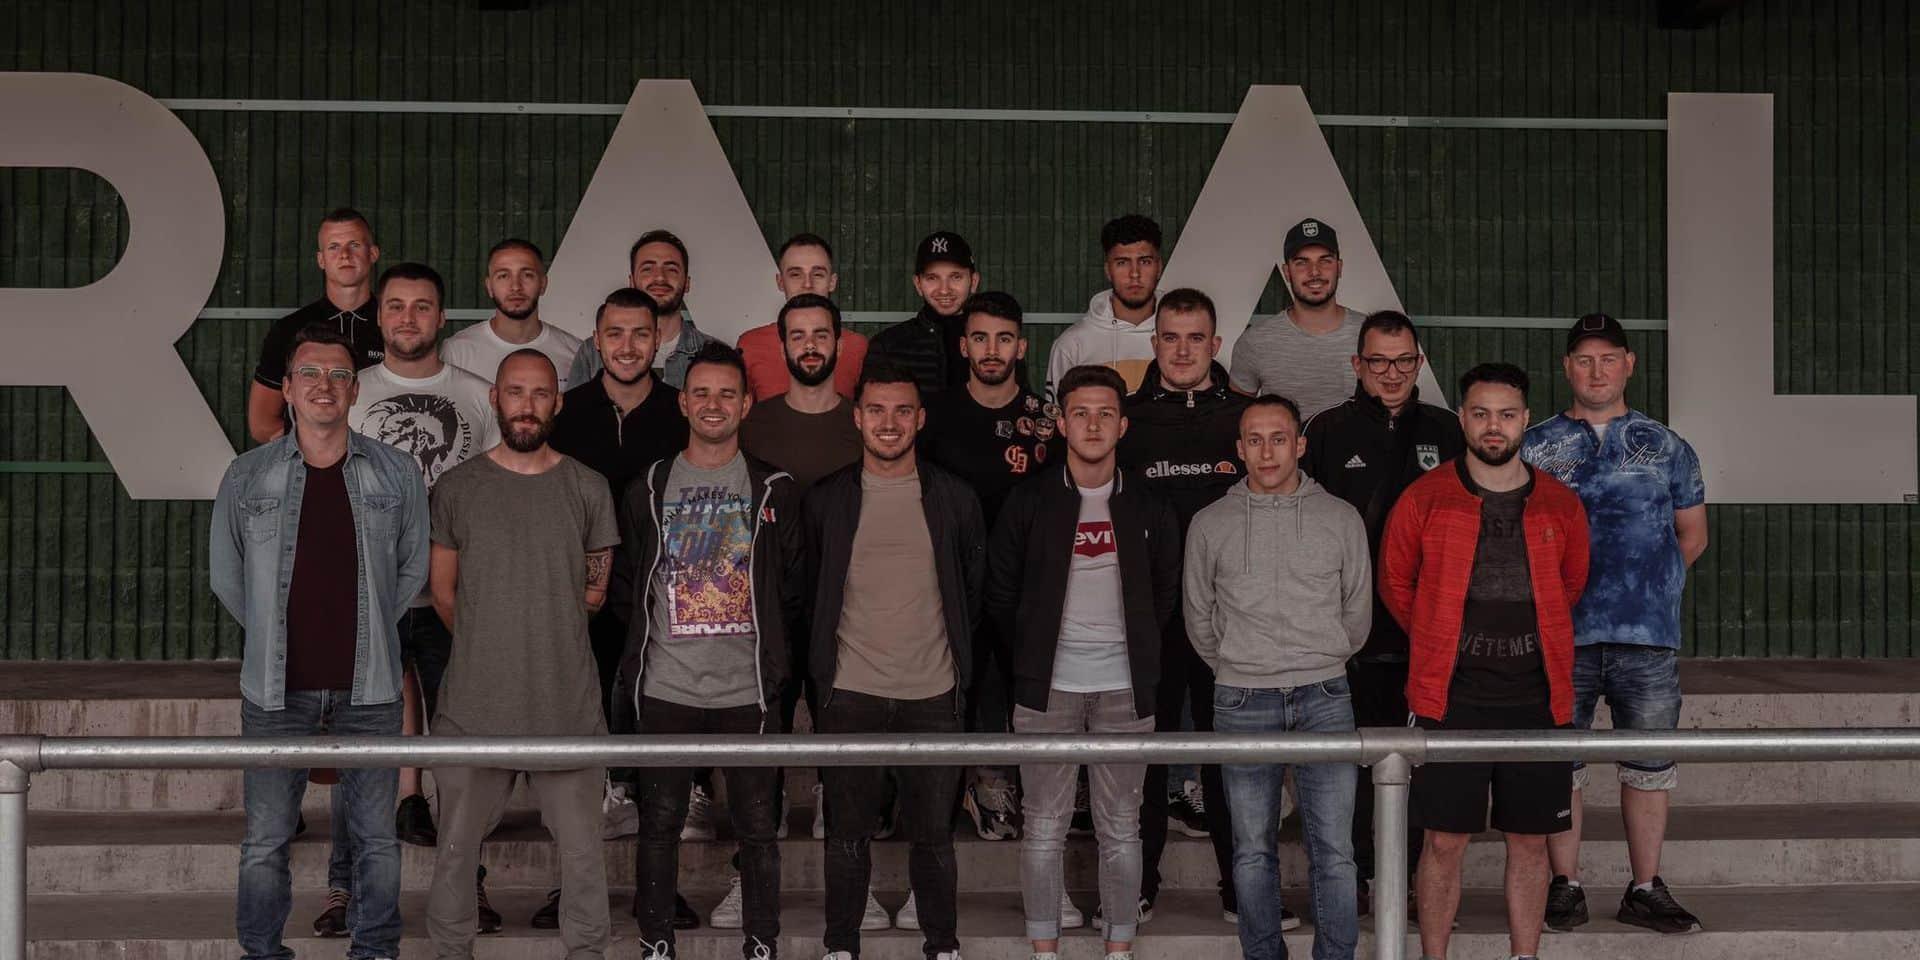 Futsal : la Raal revoit ses ambitions à la hausse